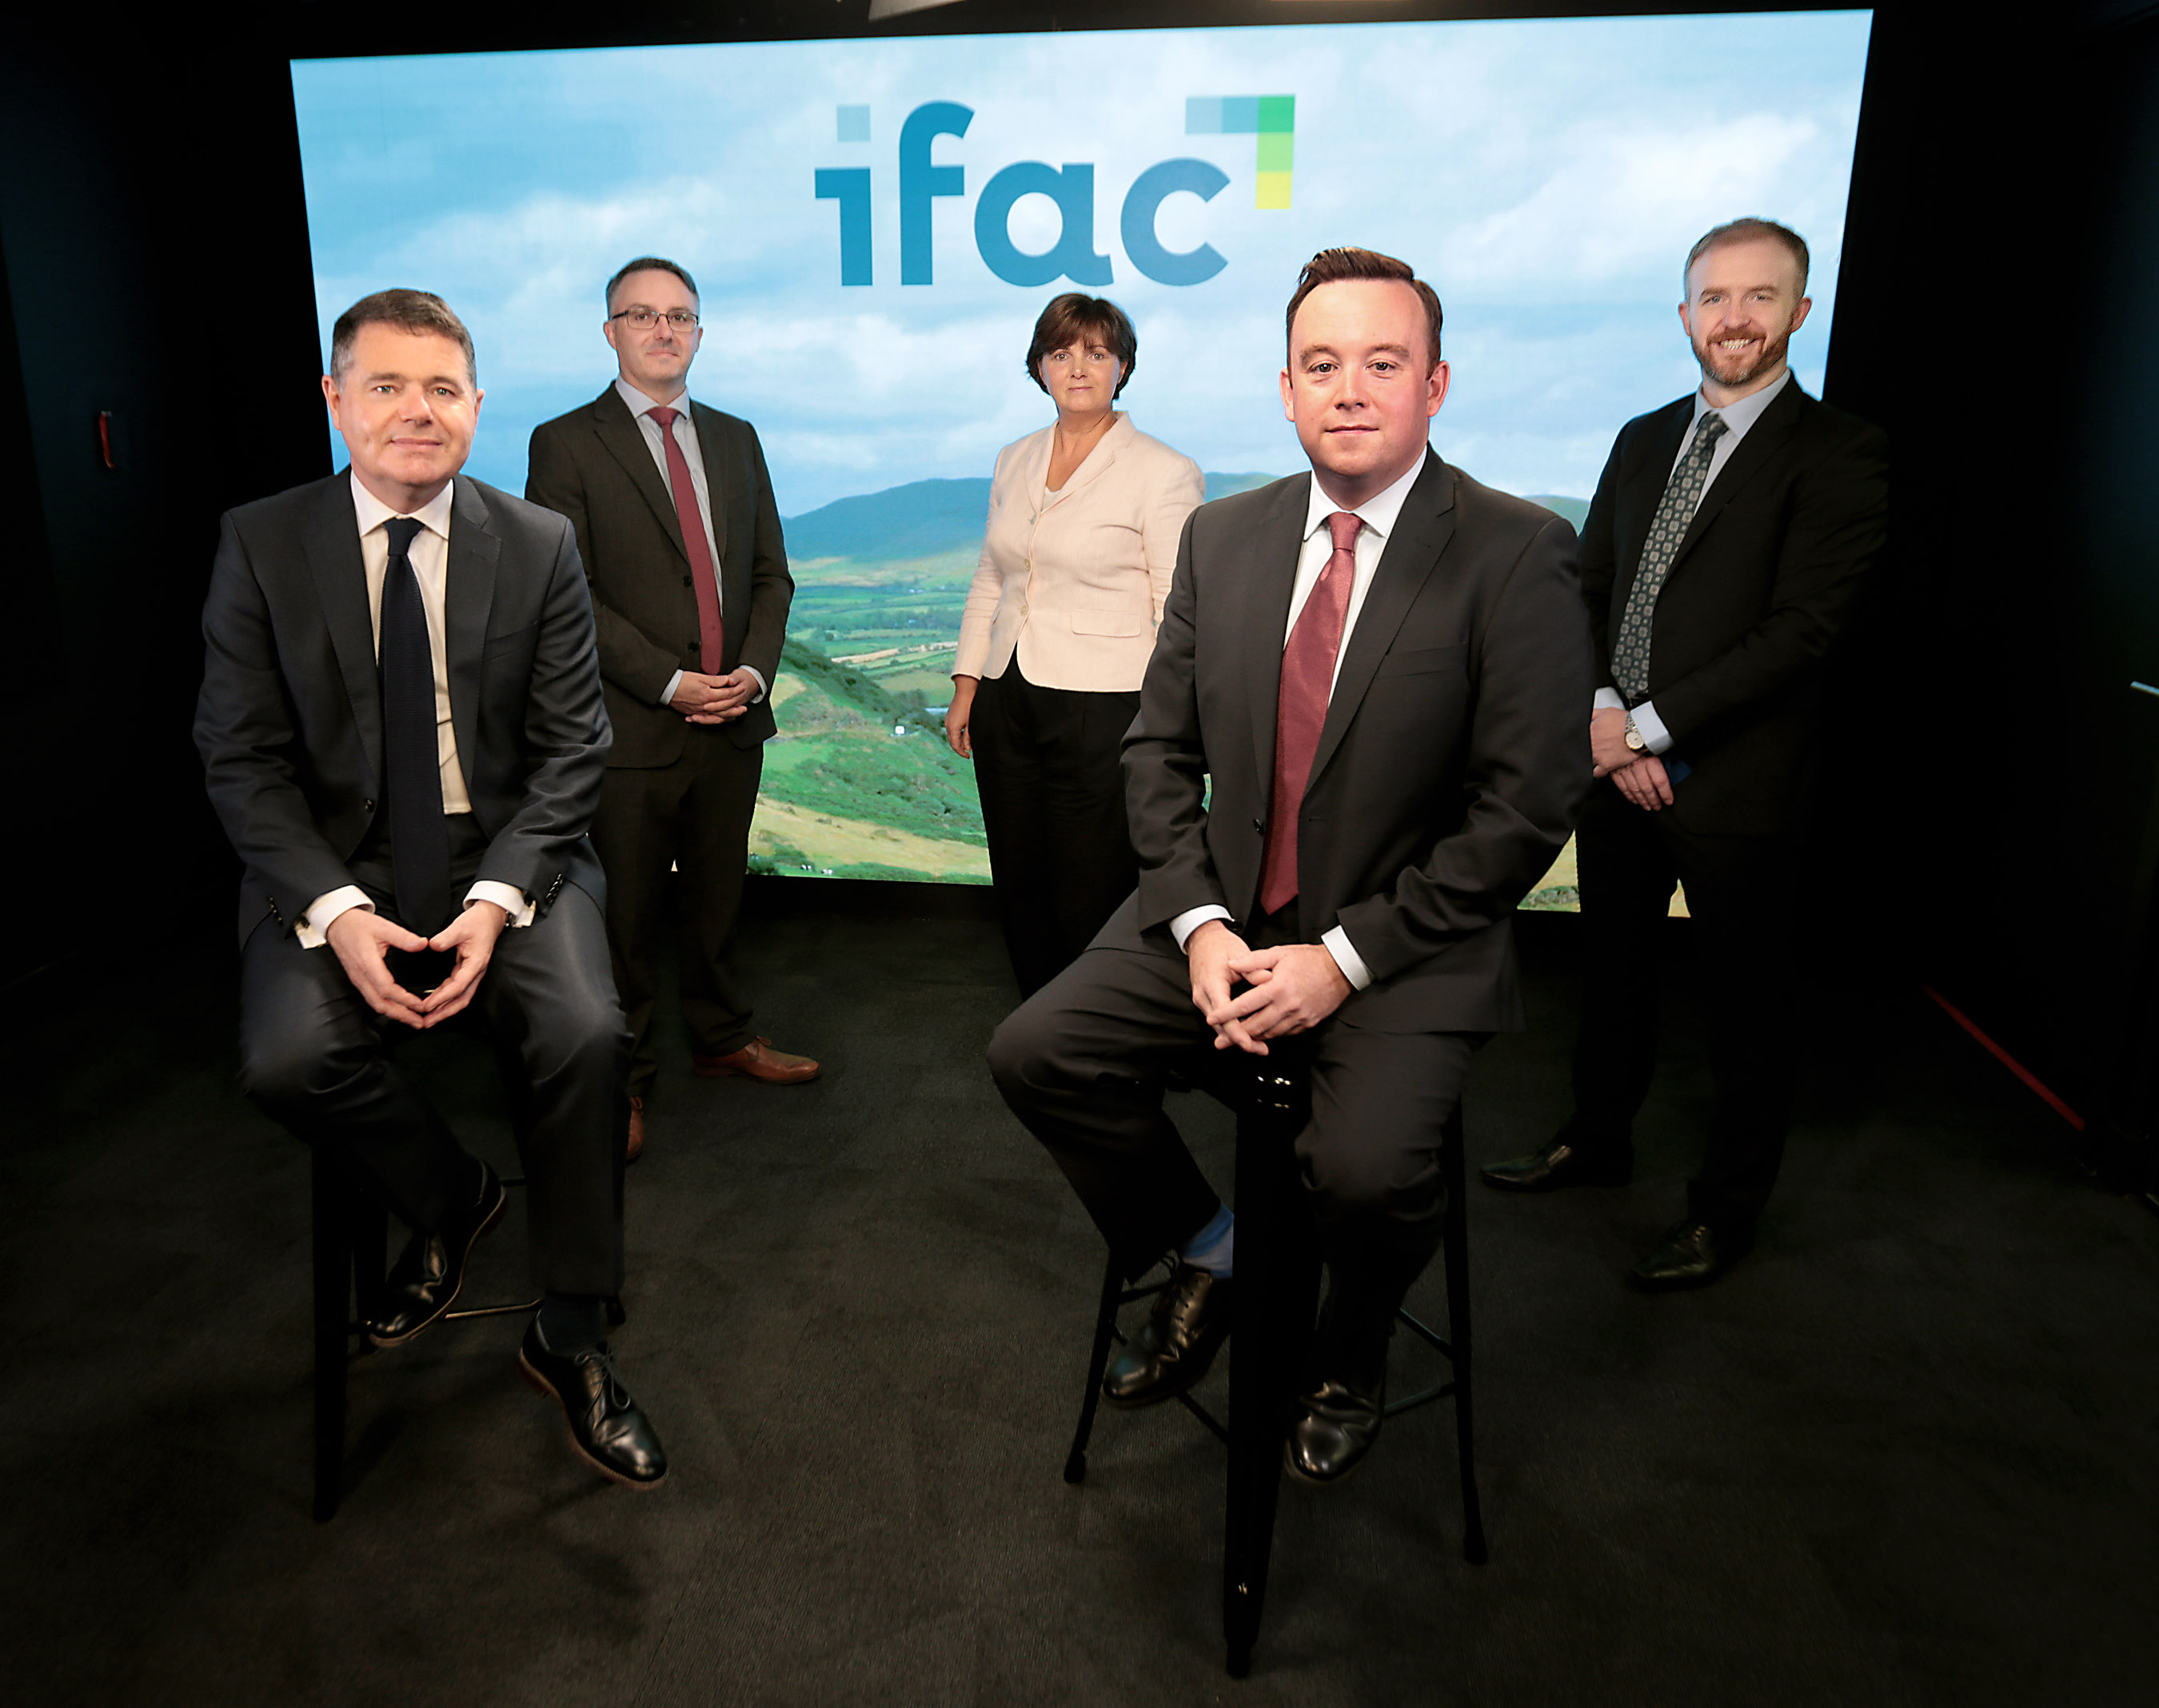 Optimisim rebounds for Irish Food & AgriBusiness SMEs